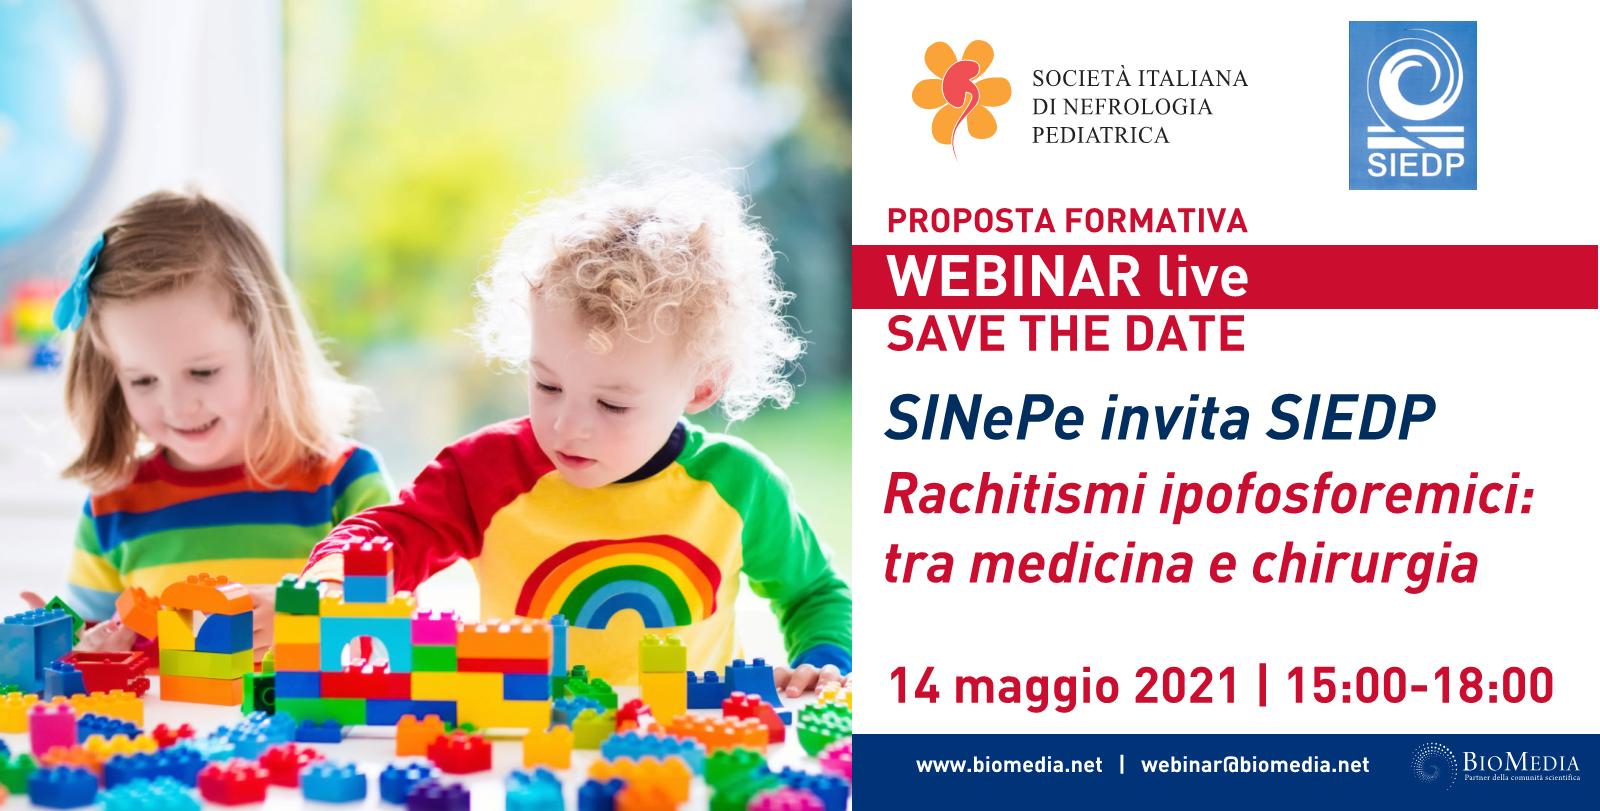 SINePe invita SIEDP. Rachitismi ipofosforemici: tra medicina e chirurgia. Webinar 14 maggio 2021